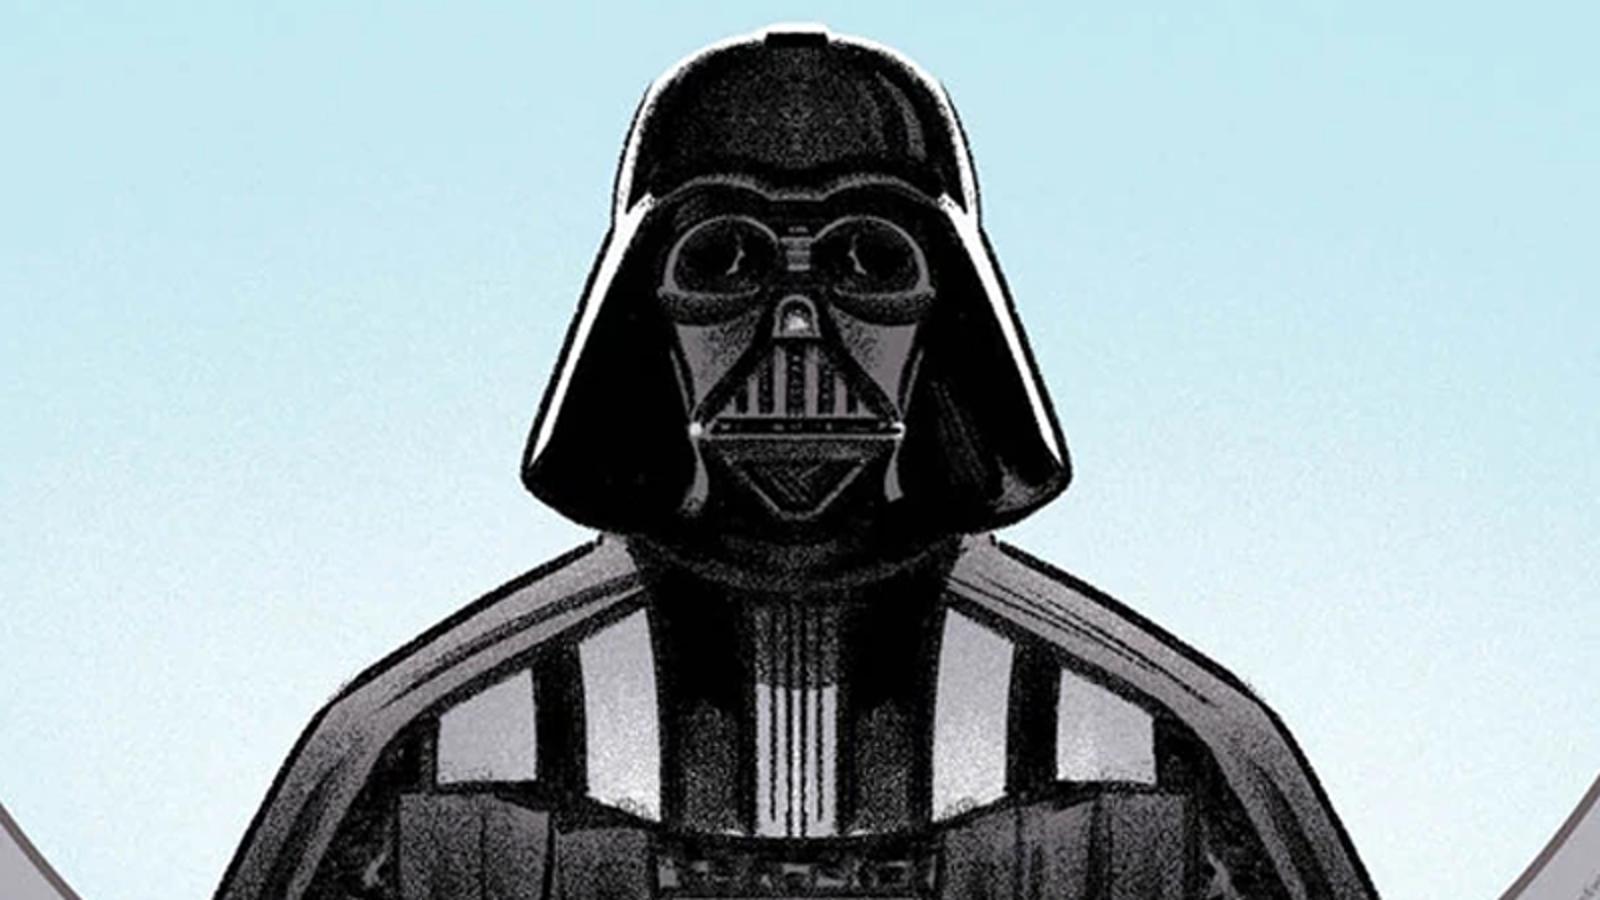 Marvel Comics Scraps New Darth VaderSeries After Chuck Wendig's Controversial Exit